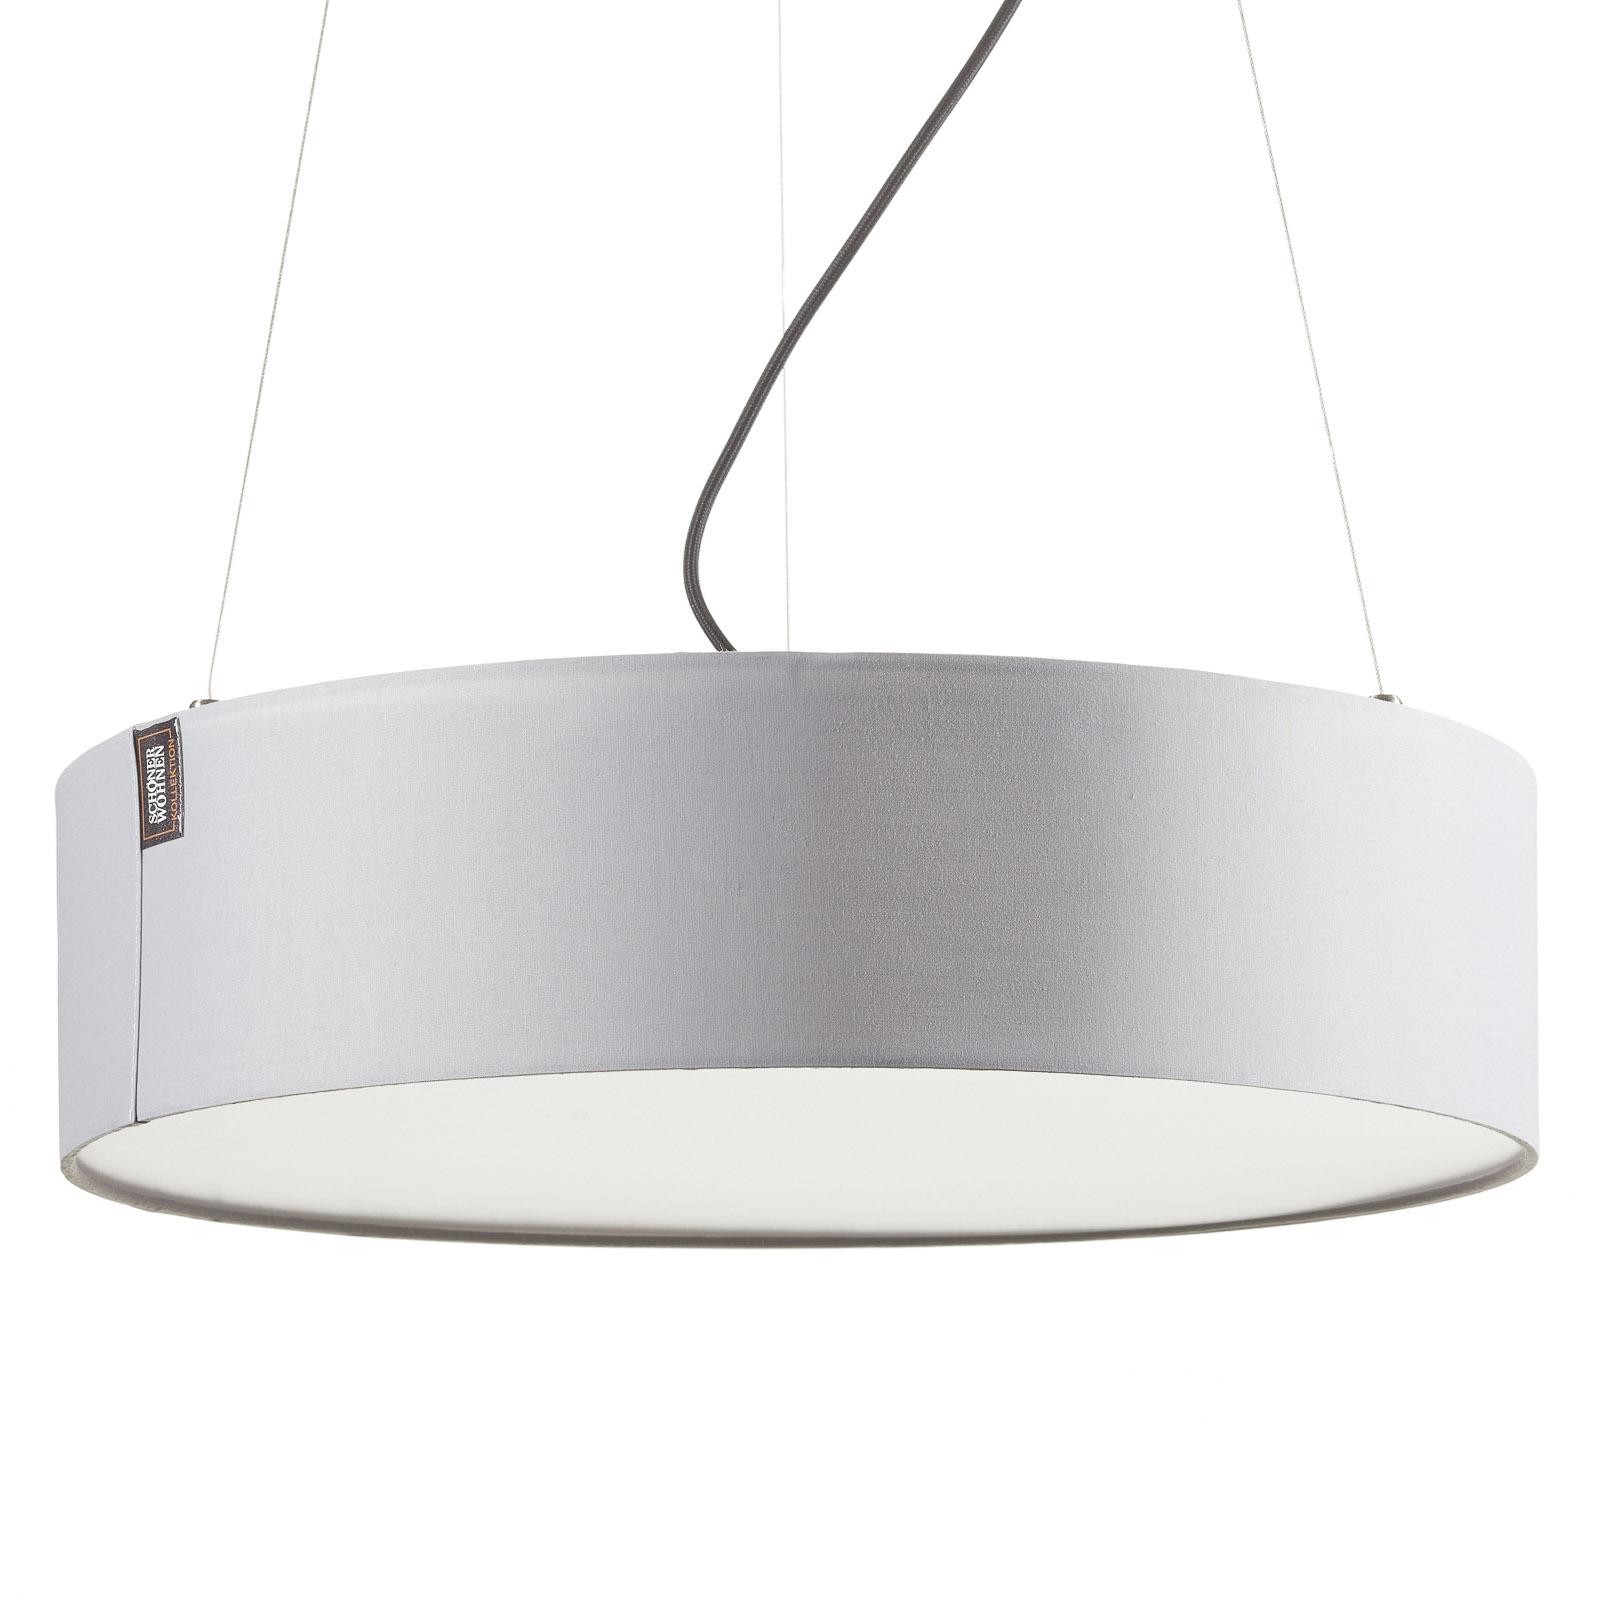 Schöner Wohnen Pina lampa wisząca jasnoszara